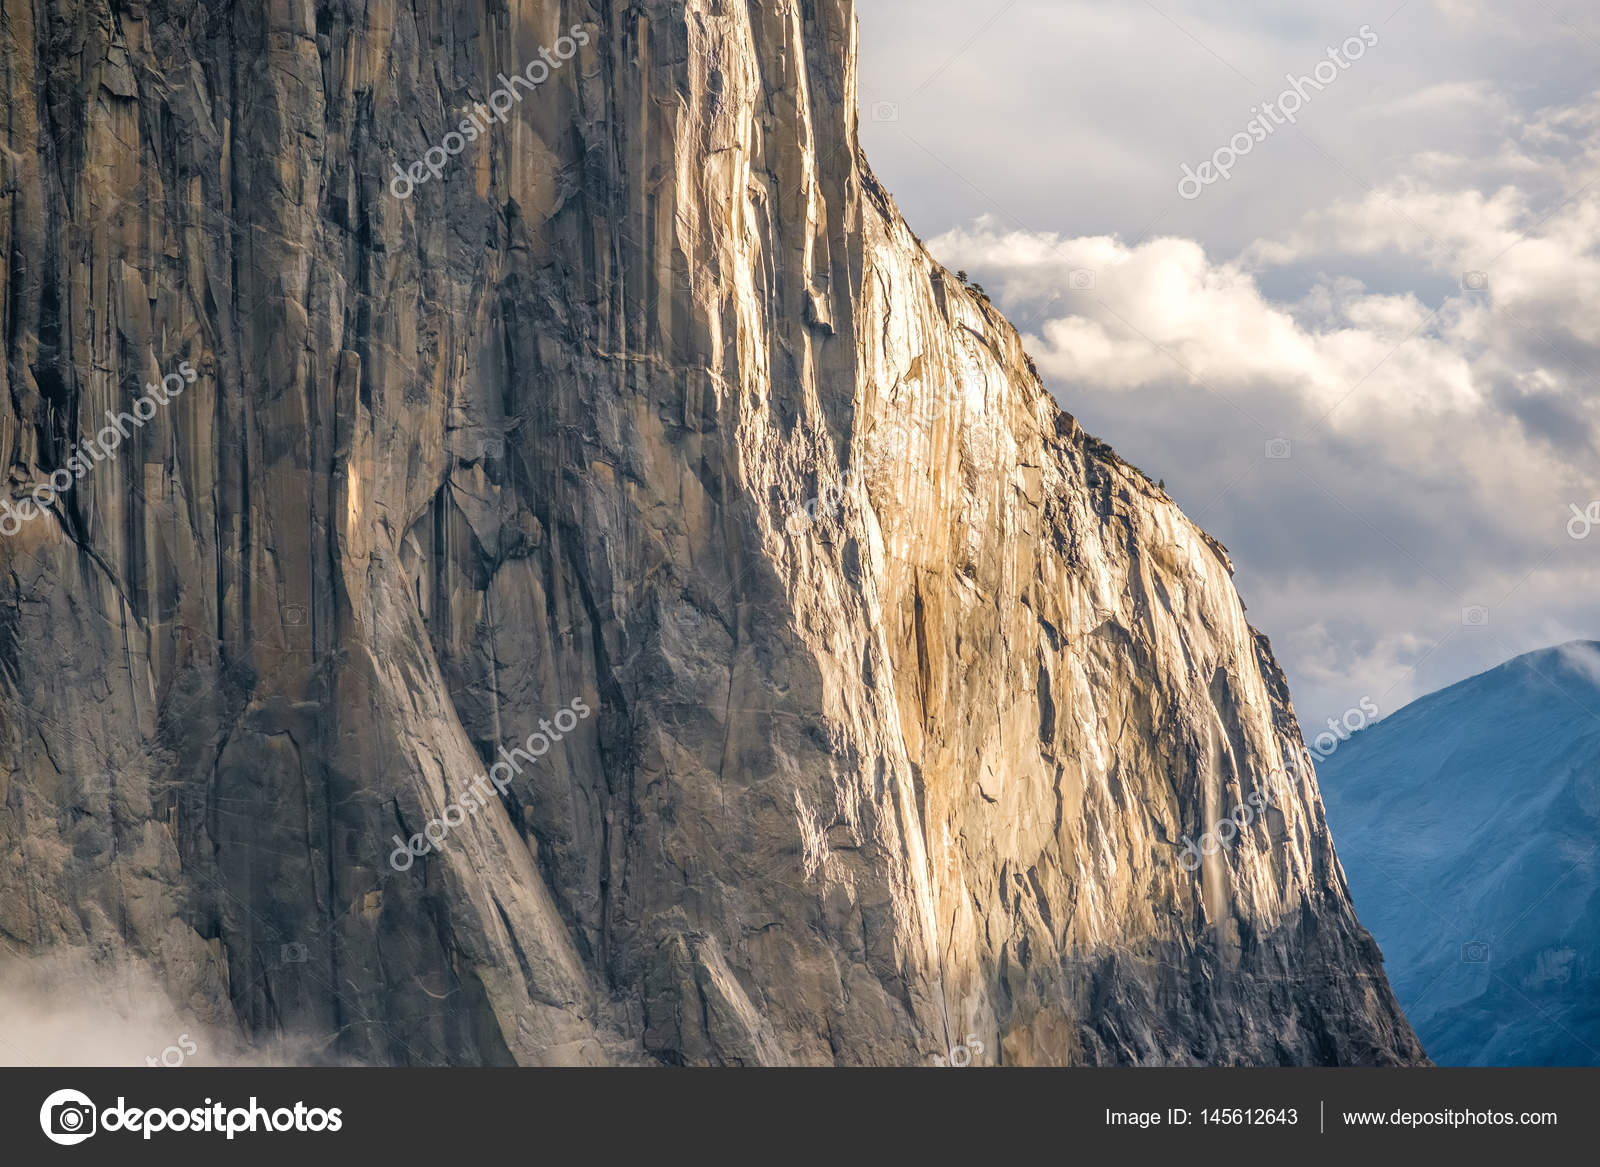 Klettersteig Yosemite : Yosemite nationalpark u2014 stockfoto © haveseen #145612643